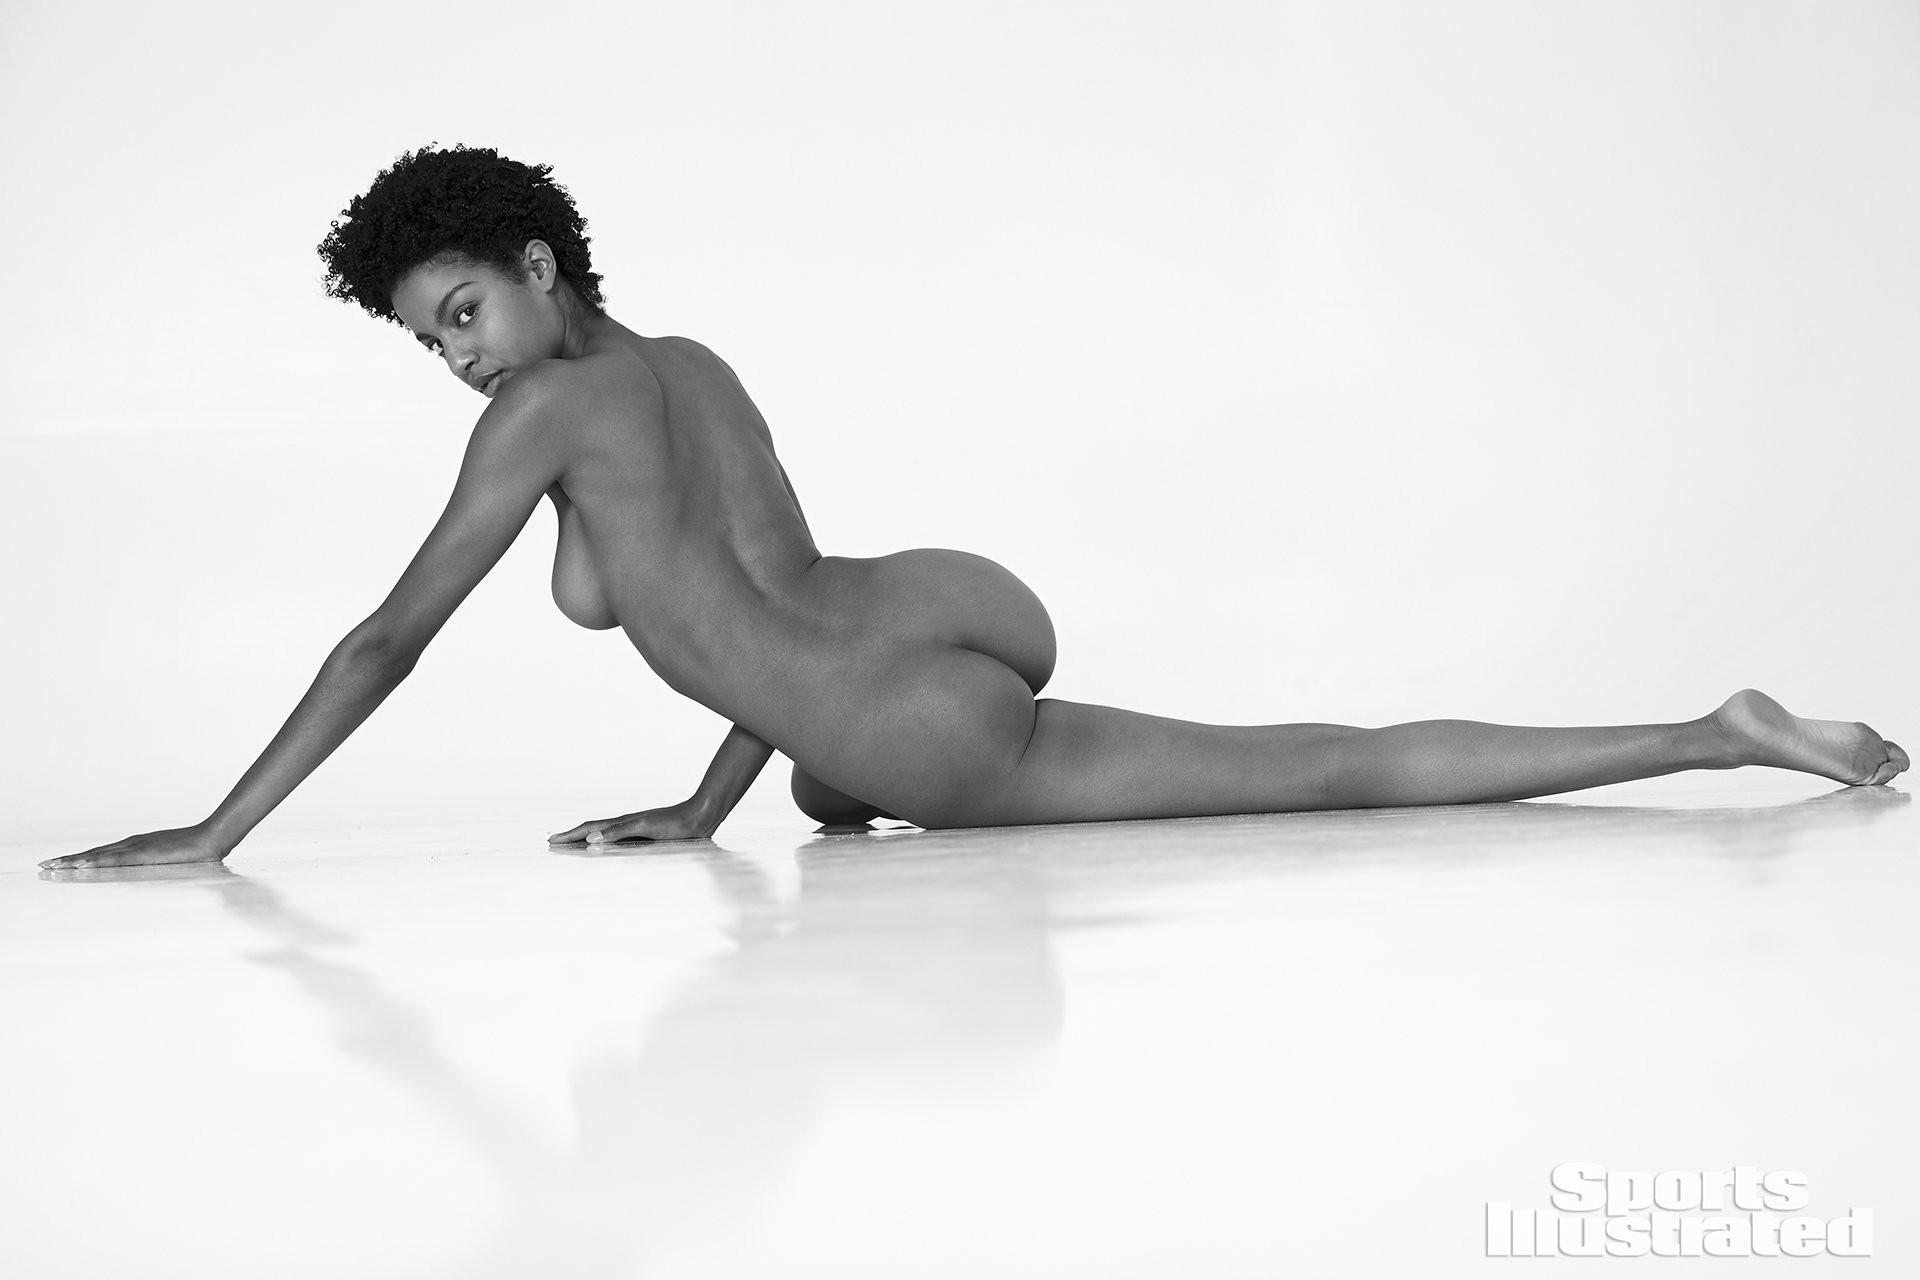 Deirdre davis nude, hot girl stripping gifs